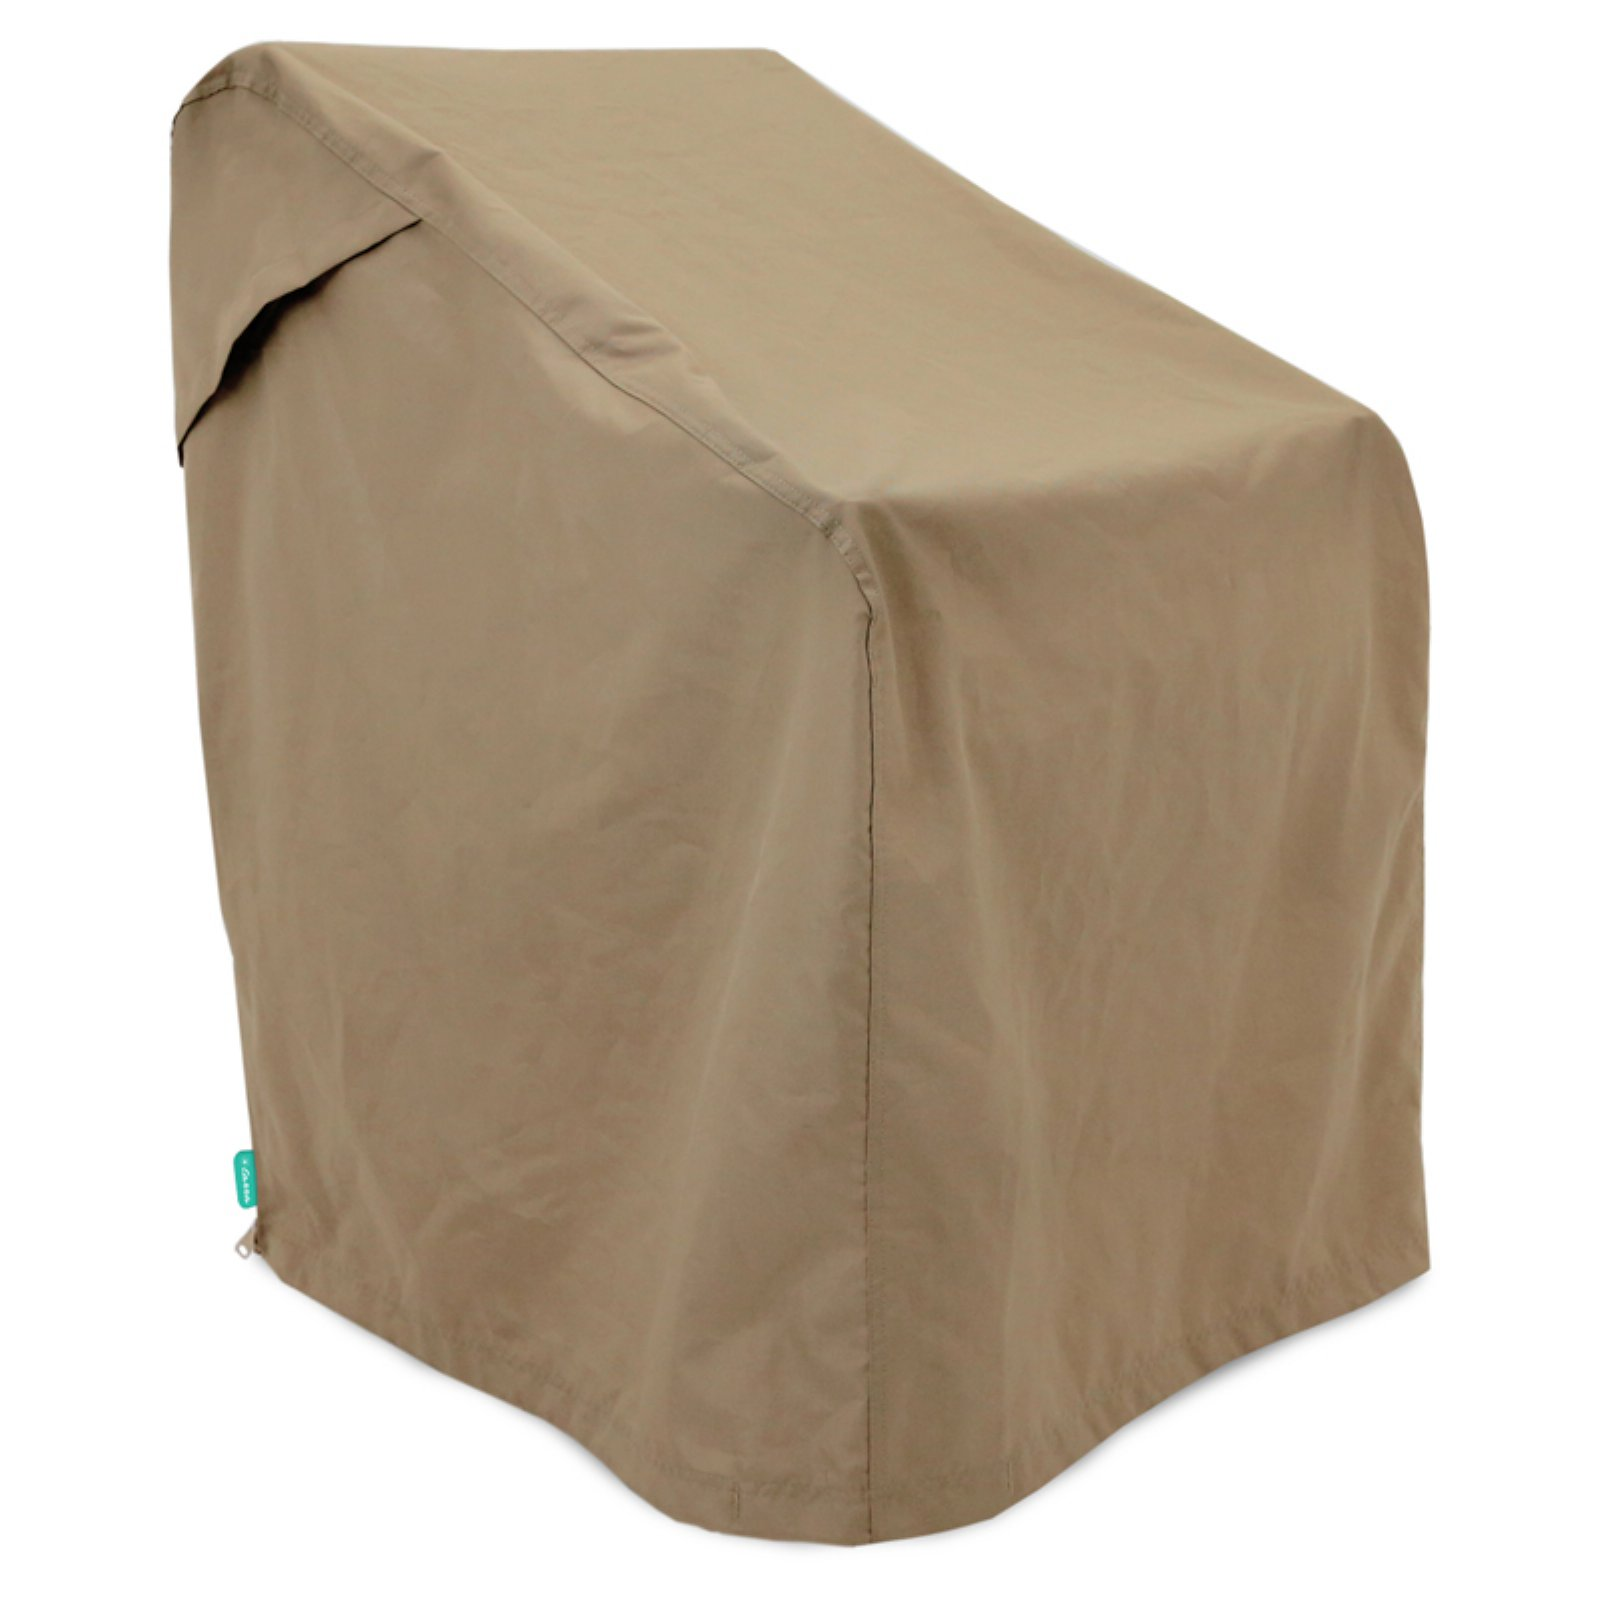 Tarra Home Universal Outdoor UFCCP262233PT Patio Chair Cover